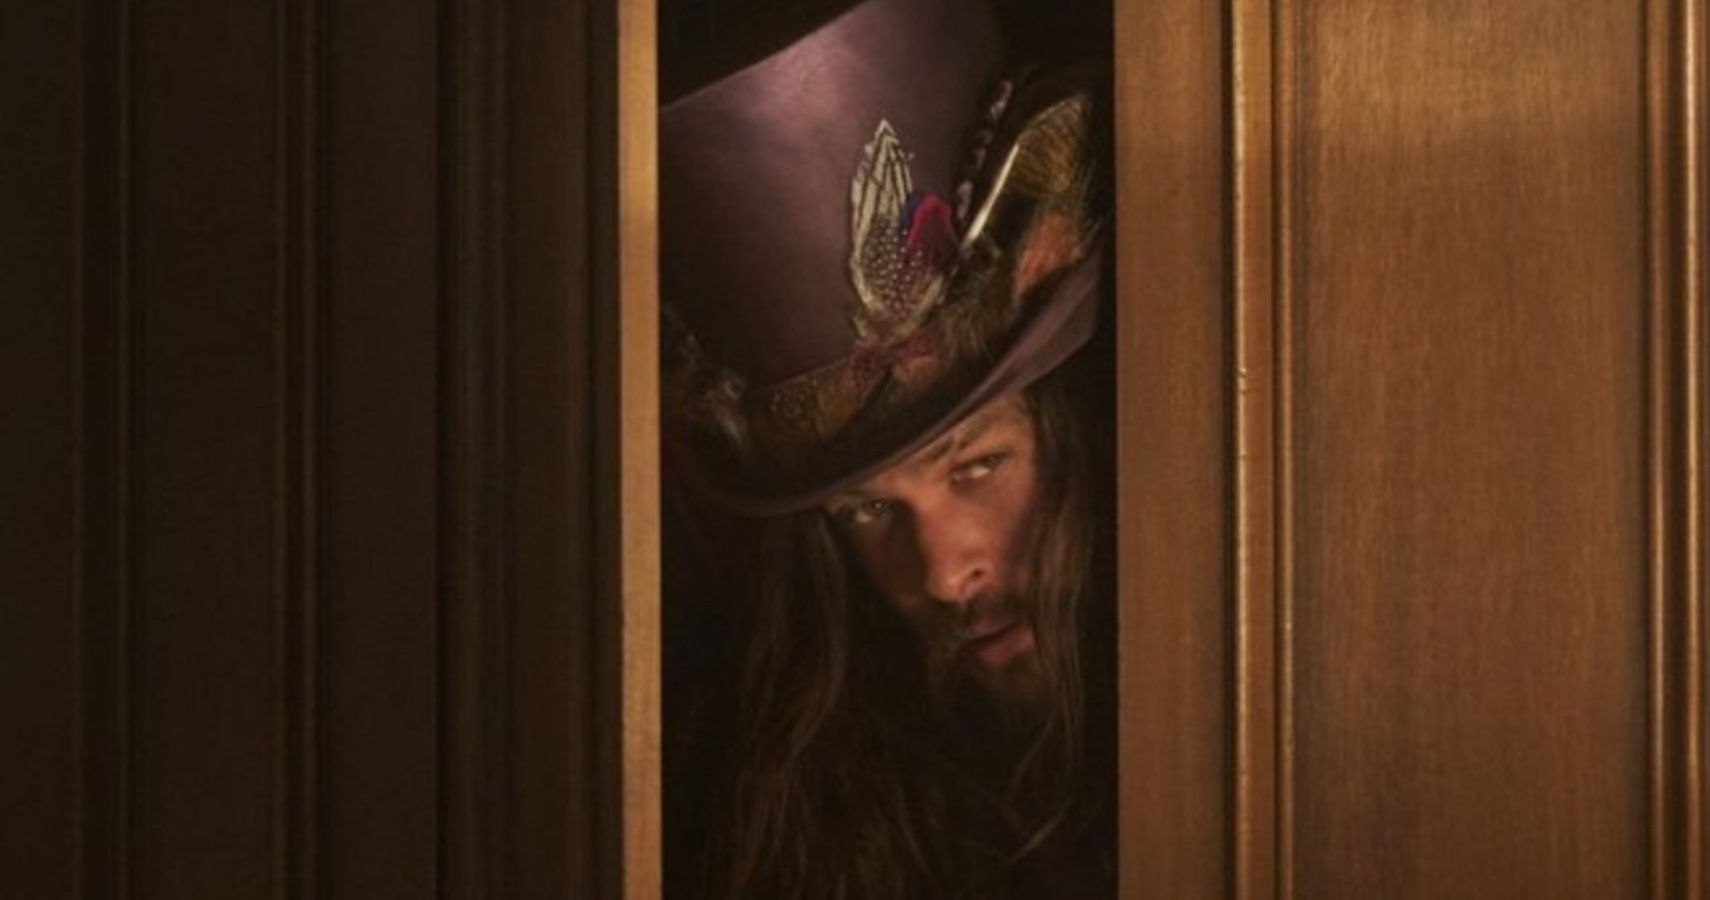 Netflix Gives Fans Sneak Peek Of Jason Momoa's Horned Character In 'Slumberland'